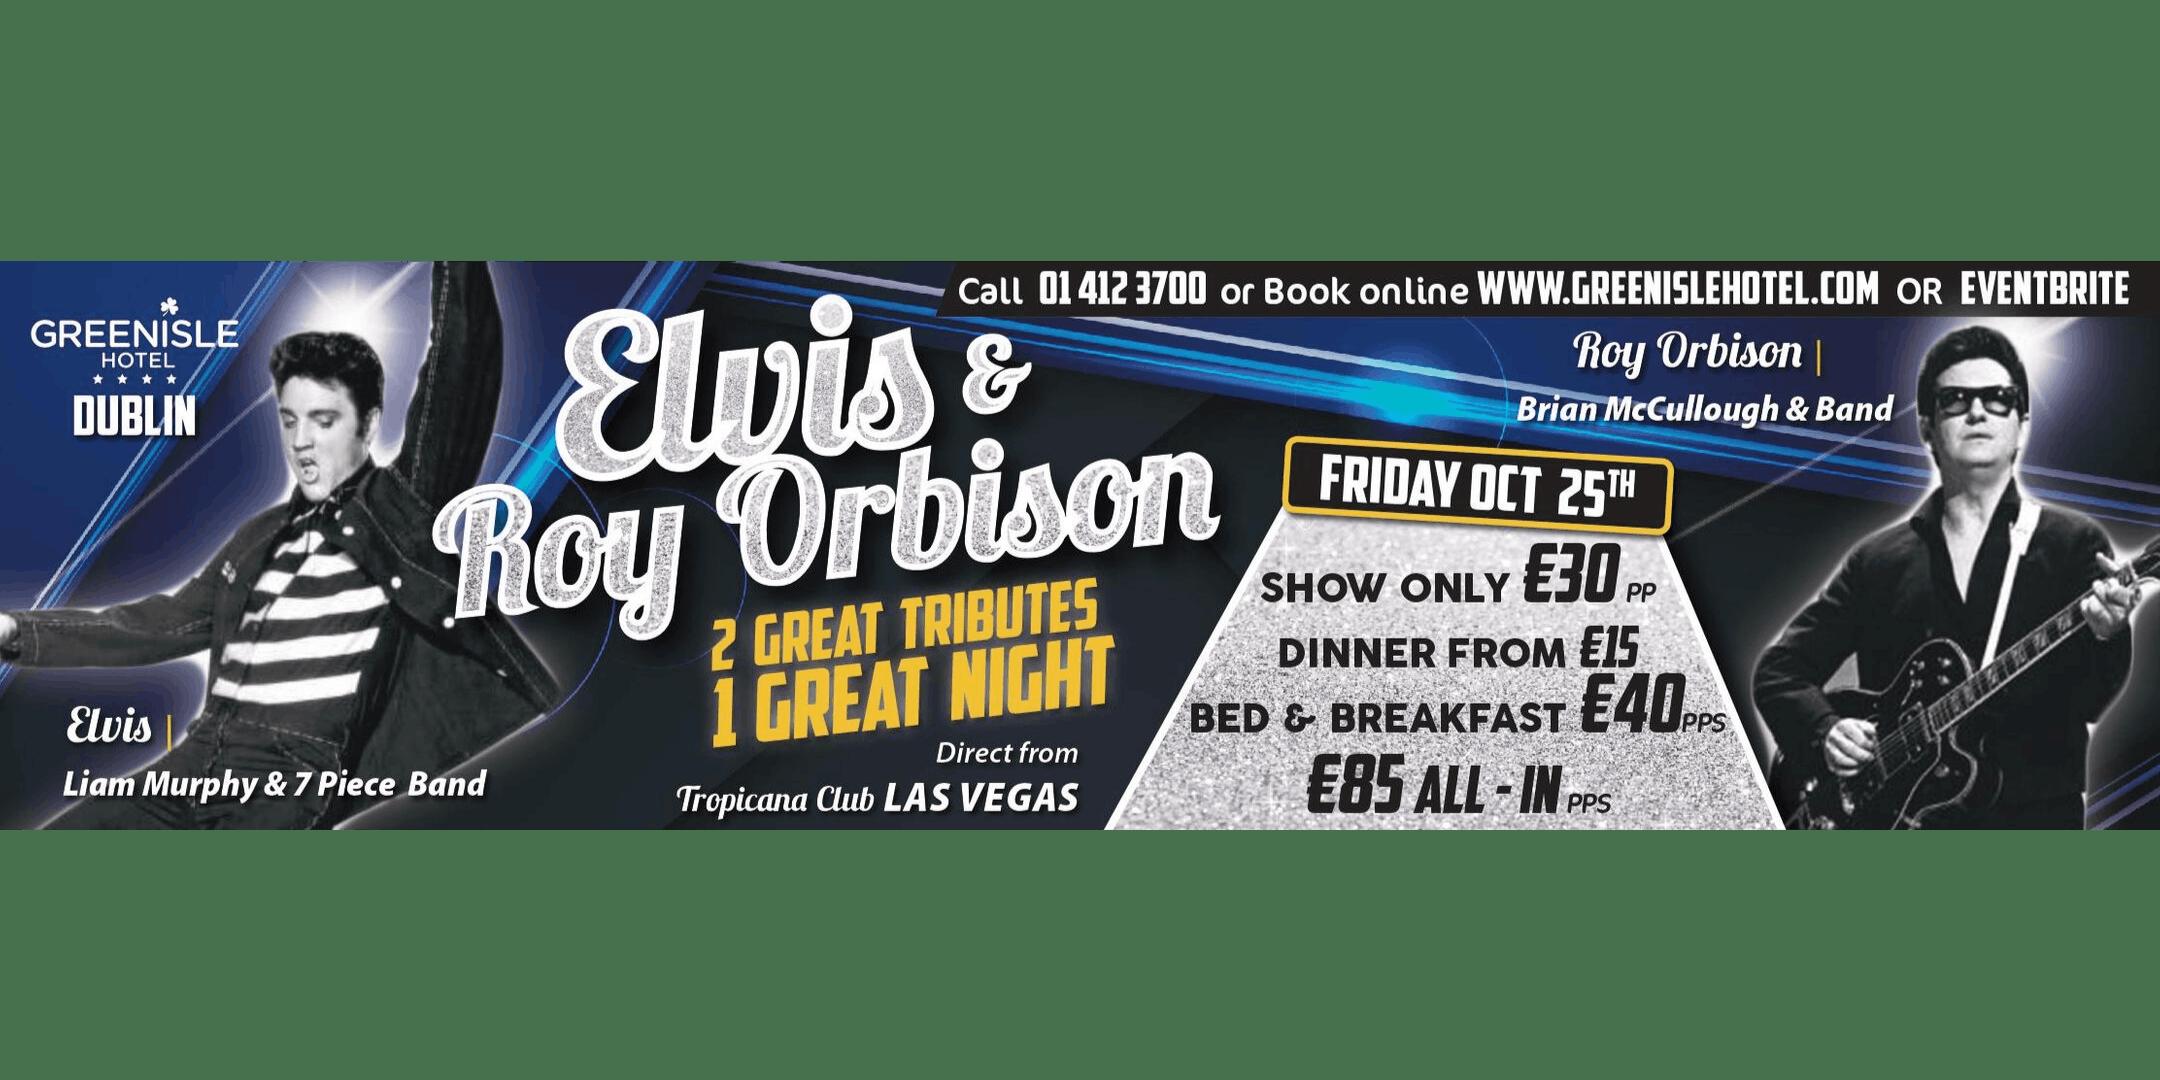 The Green Isle Hotel Presents Elvis Presley & Roy Orbison